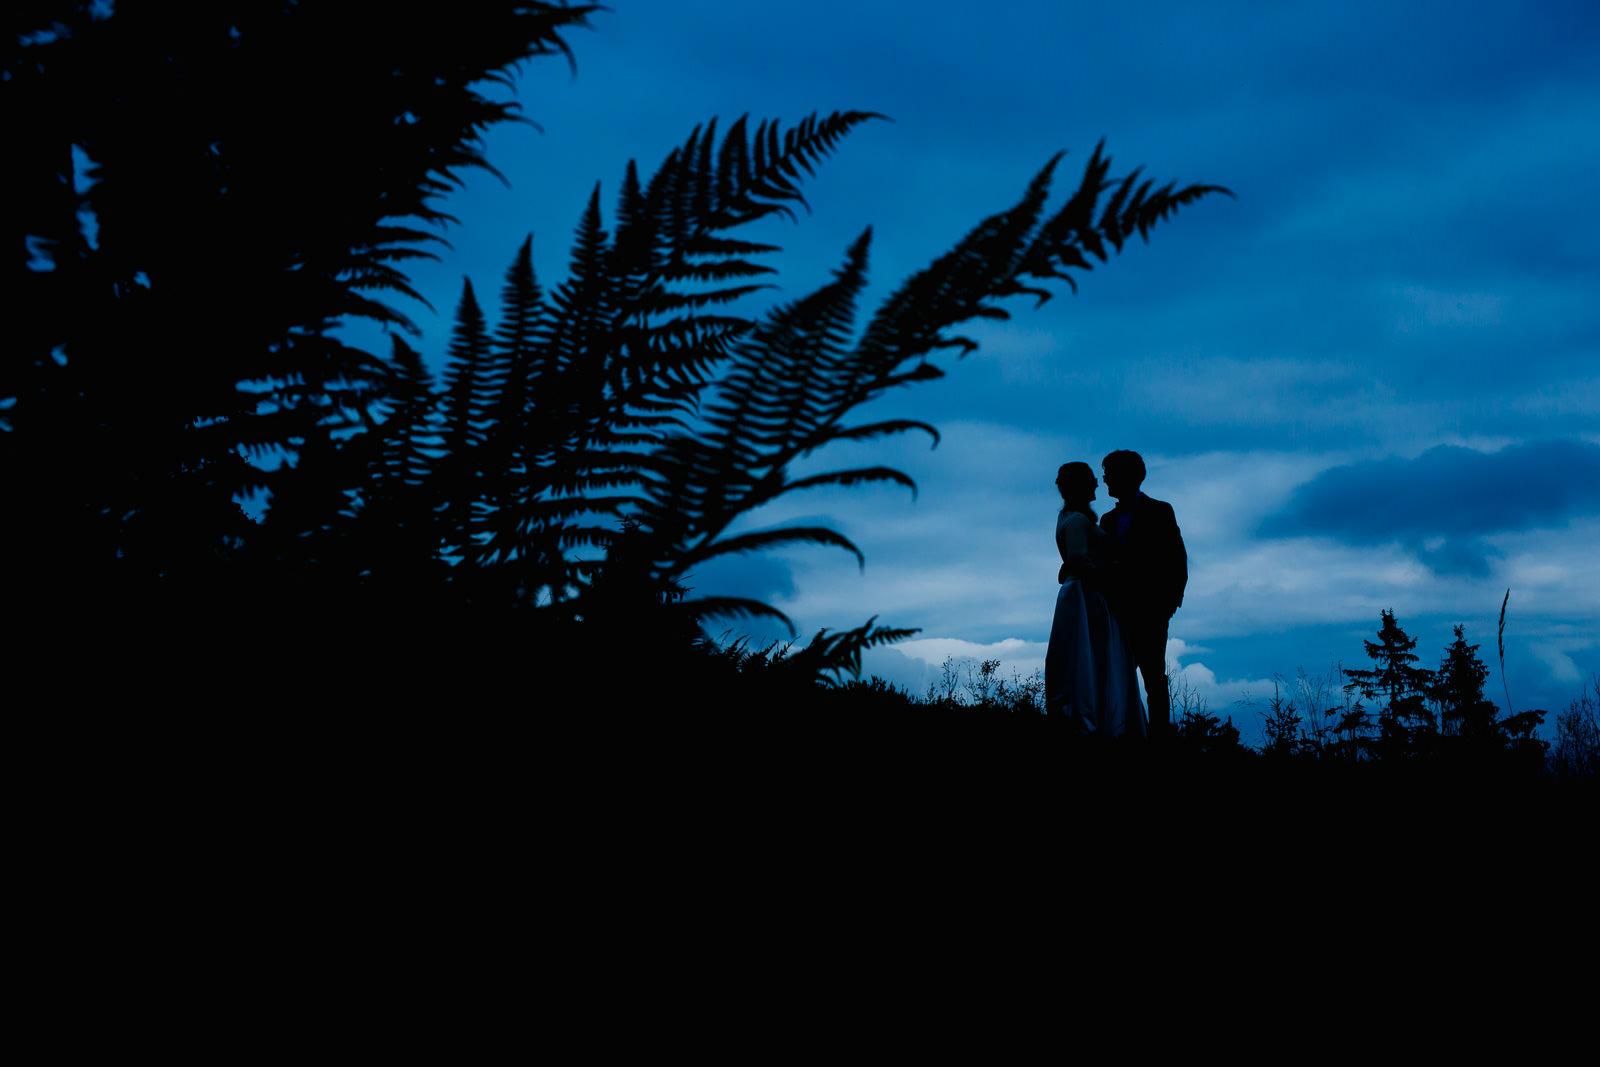 bryllupsbilde-fotograf-bryllup-jan-ivar-vik-blikkfangerne4.jpg